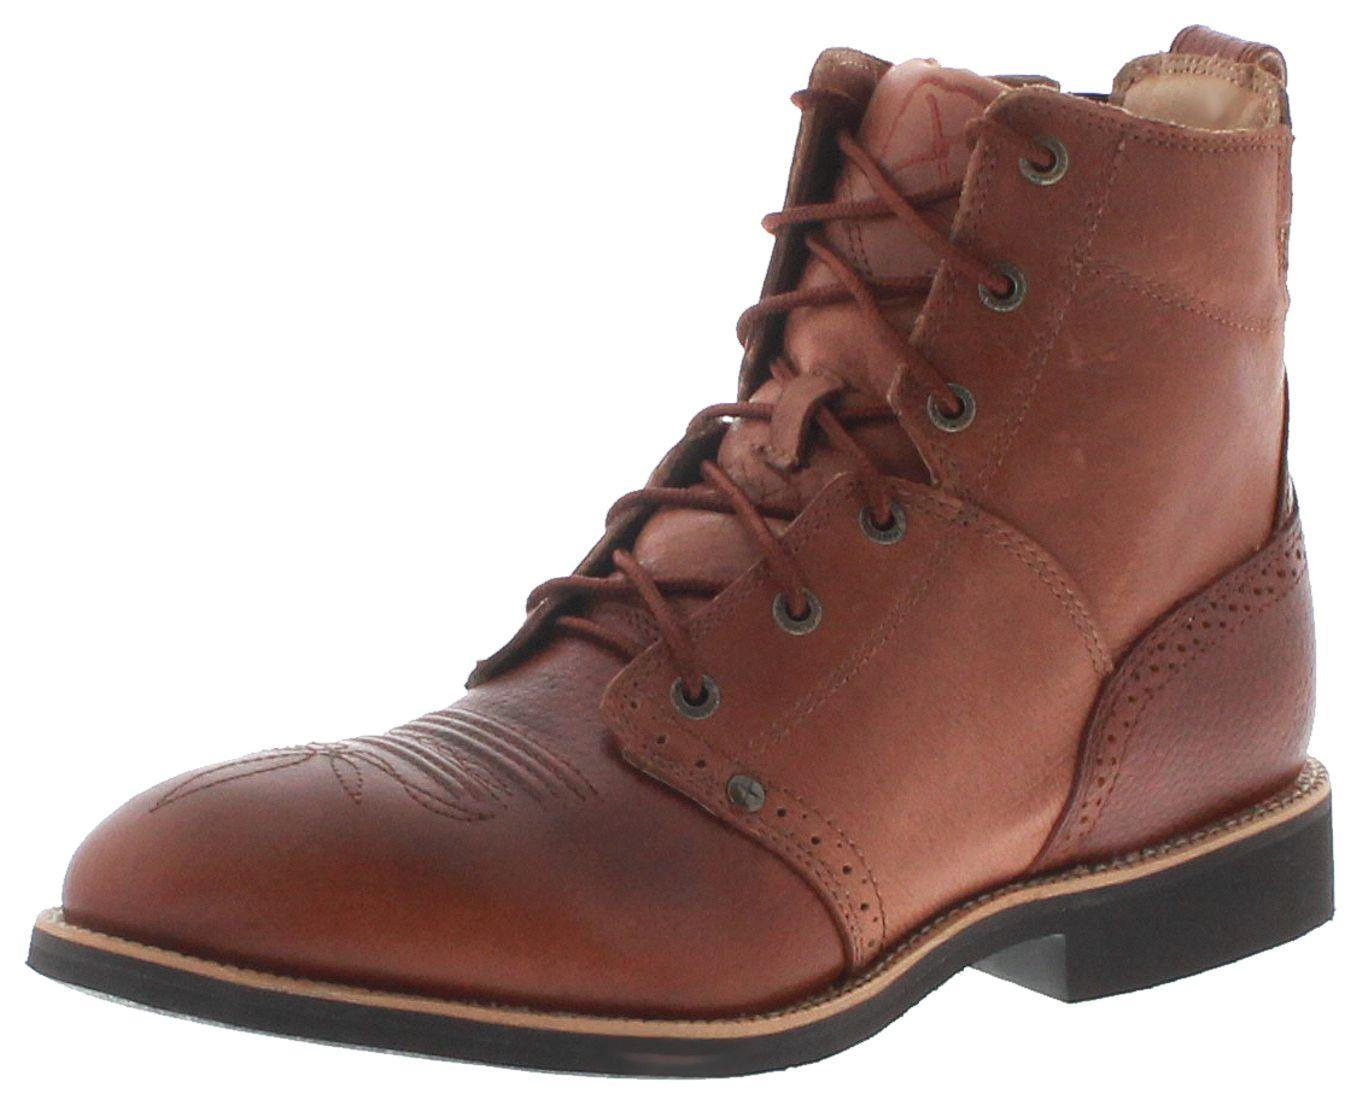 Twisted X Boots 1706 CALF ROPER LACER Cognac Herren Reitstiefelette - braun